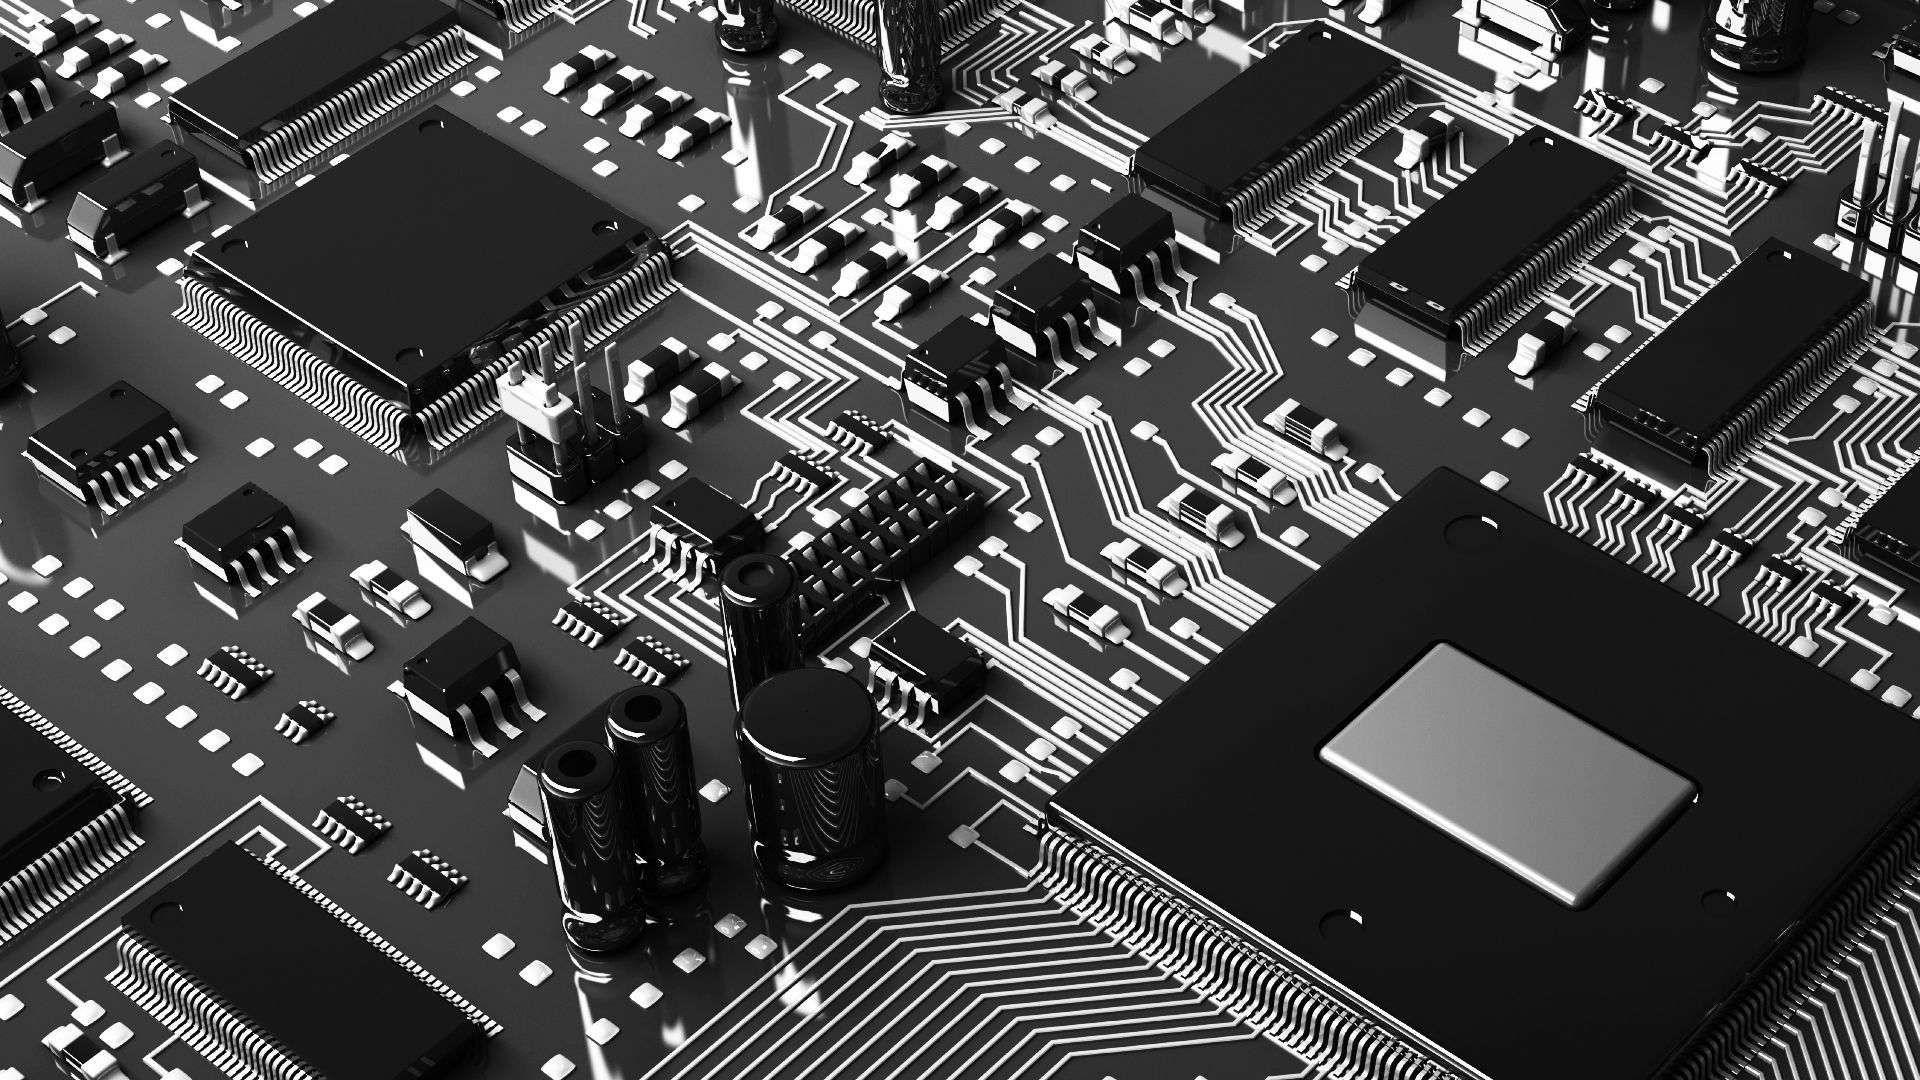 circuitboard http www fullhdwpp com computers circuitboard rh pinterest com circuit board wallpaper hd circuit board hd mobile wallpaper